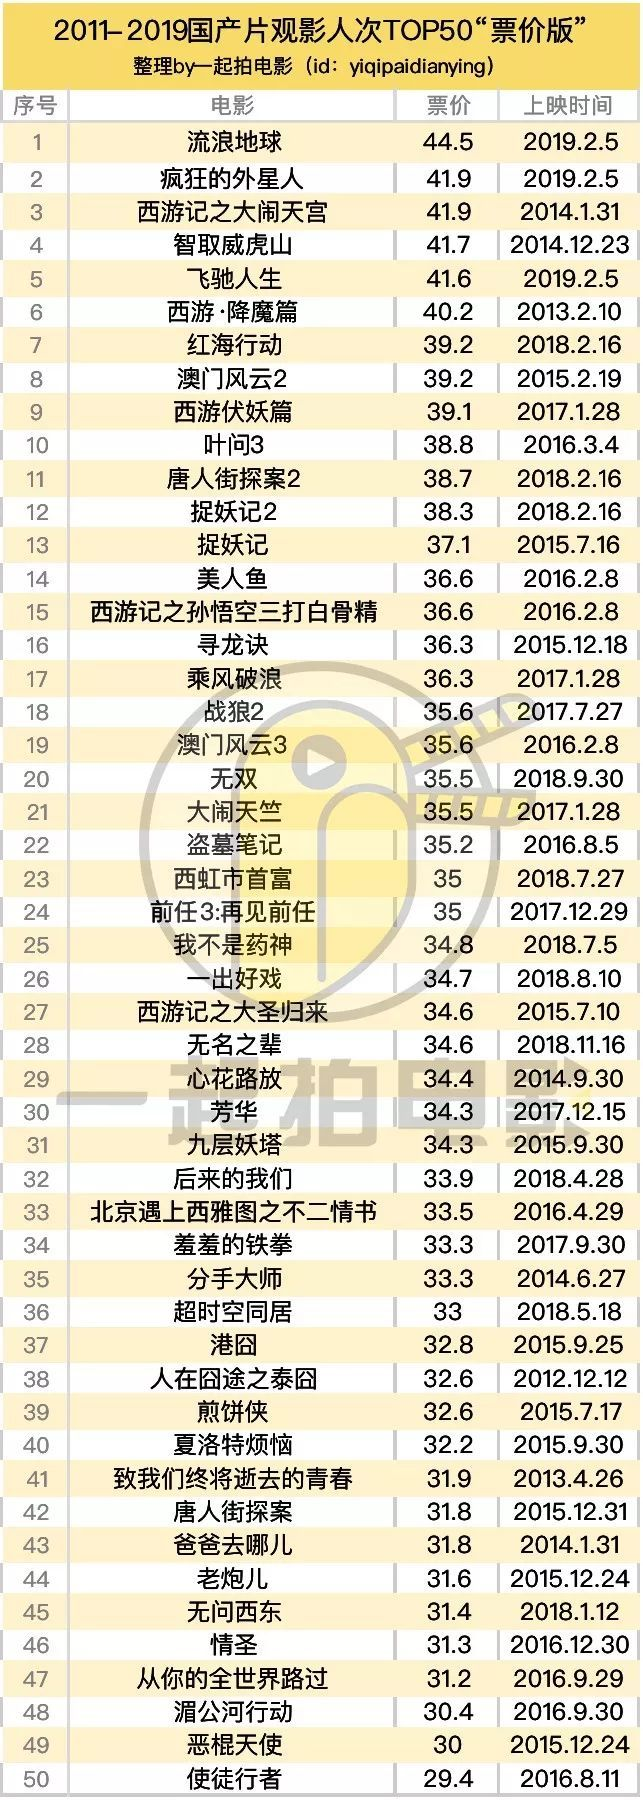 2d排行榜2019_2019年第1周白电畅销机型排行榜分析:海尔冰箱霸榜附榜单